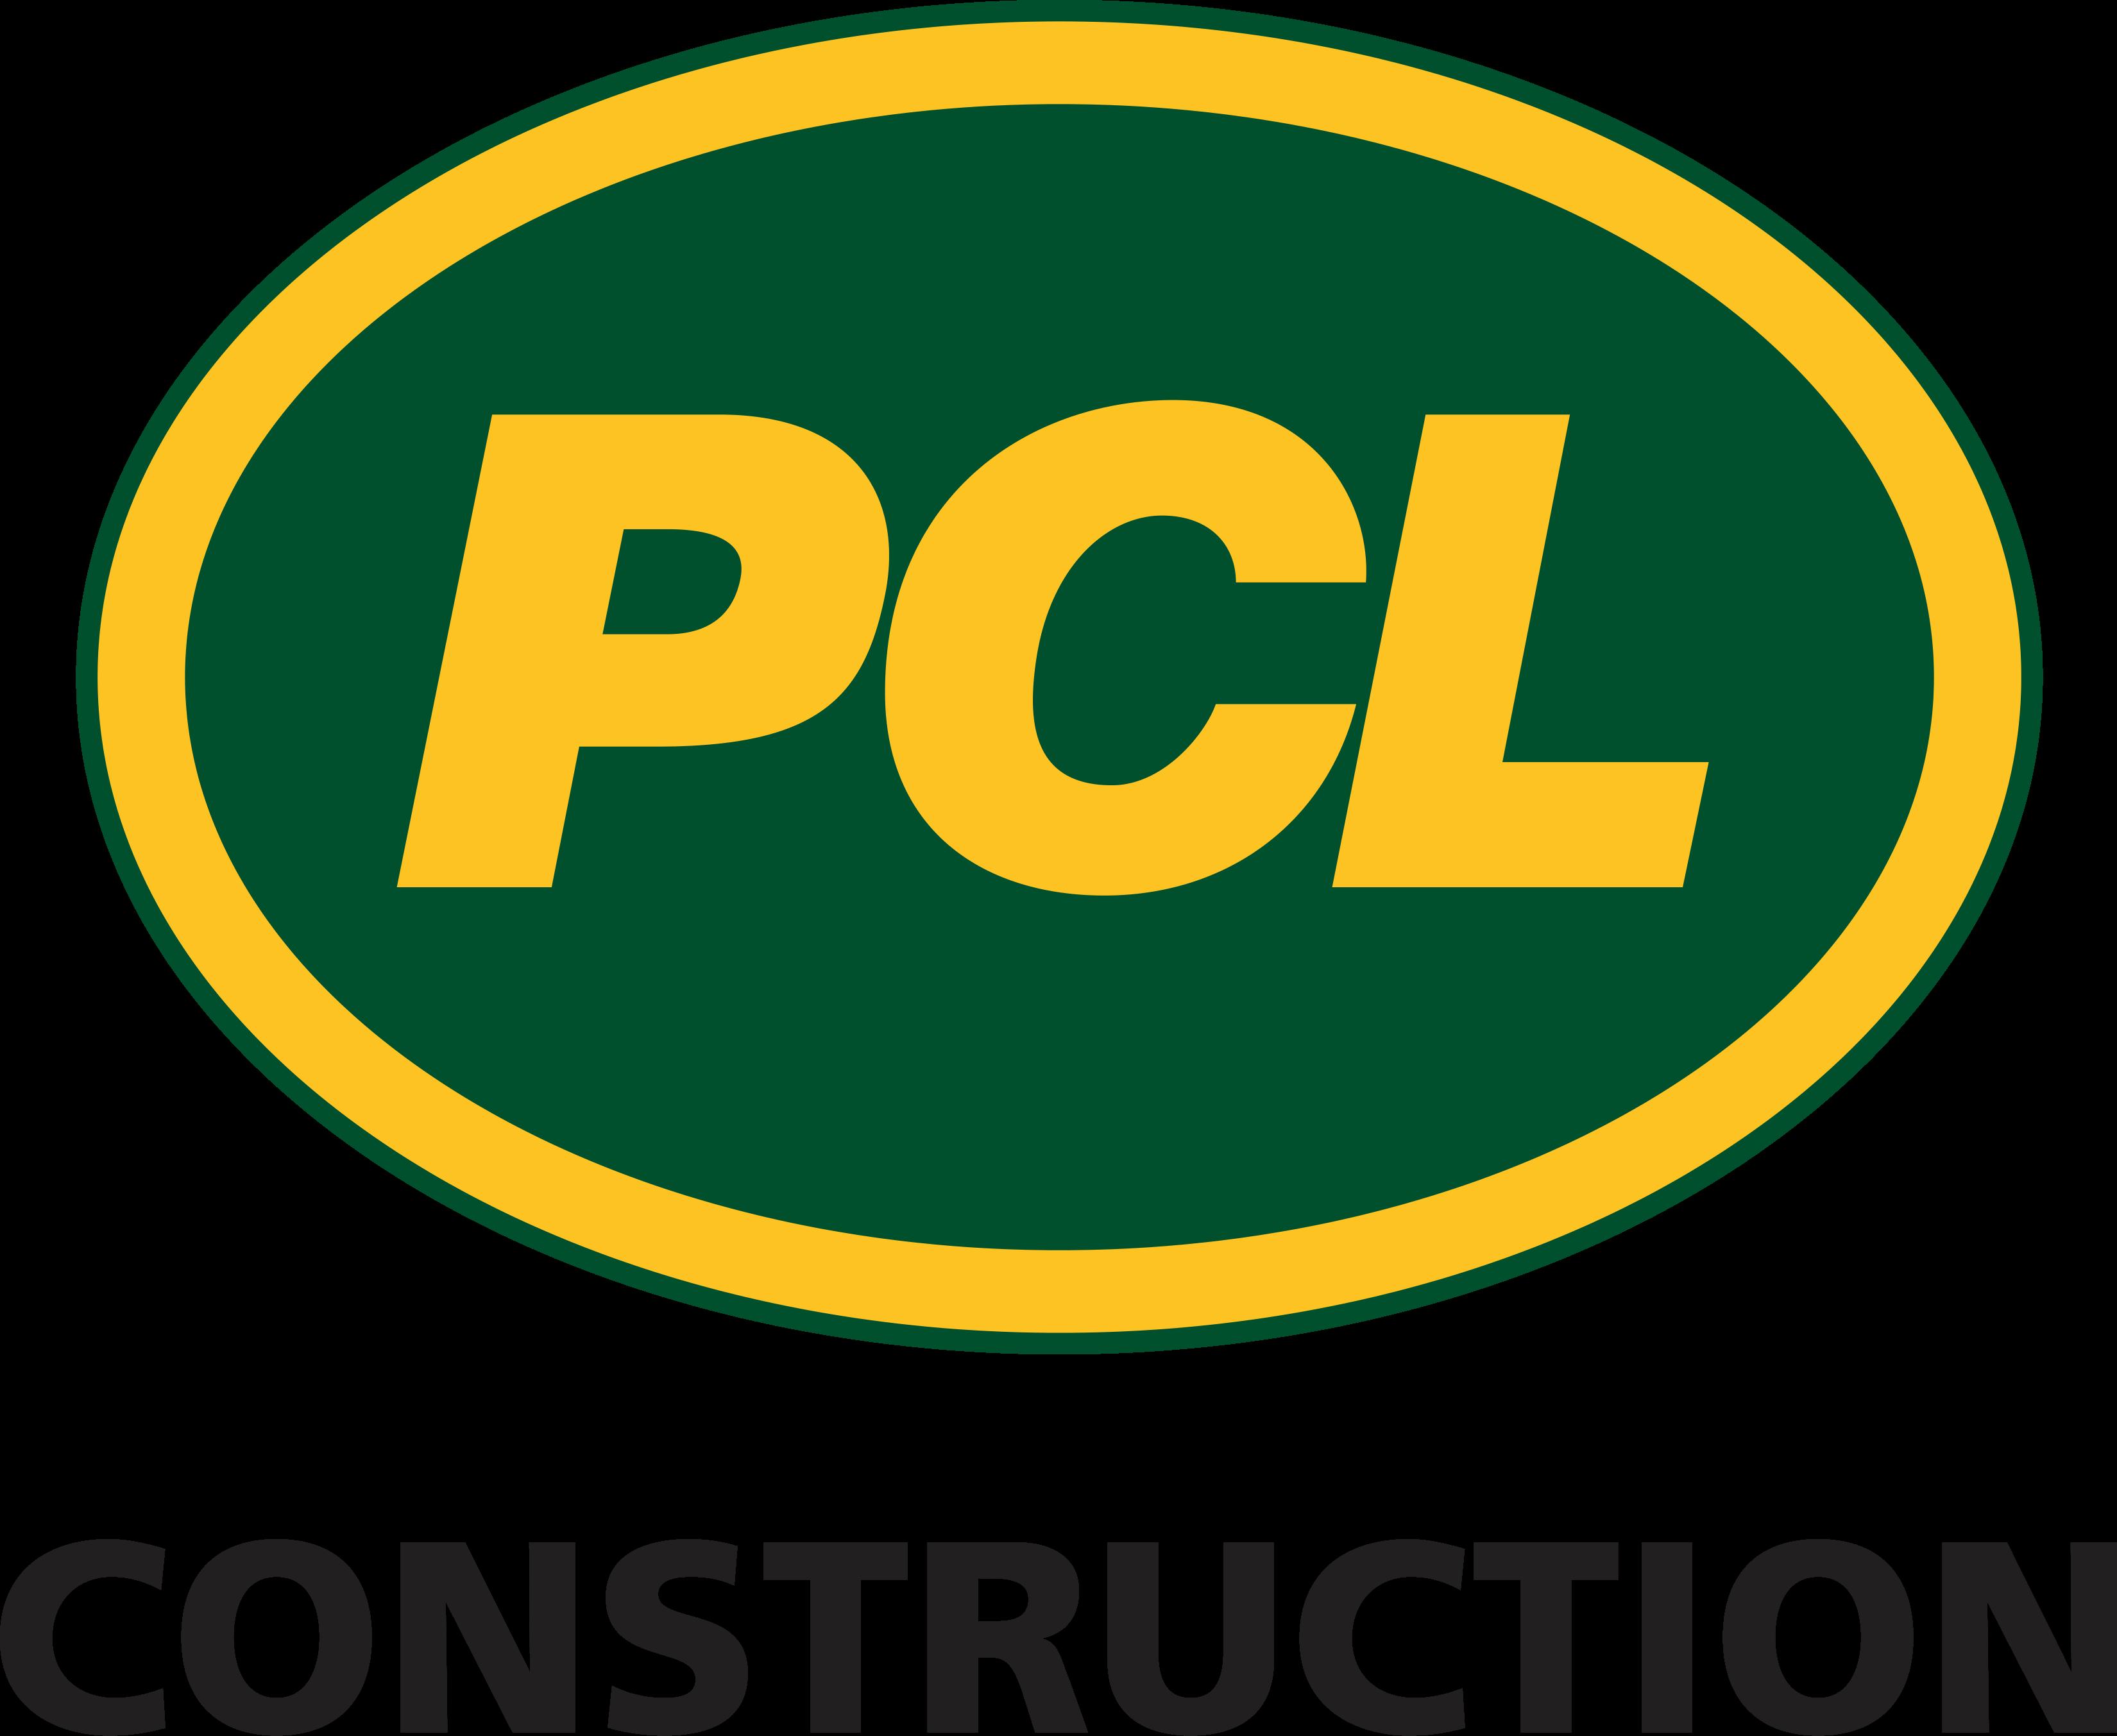 PCL SMART Construction Technology Challenge | Alberta Innovates